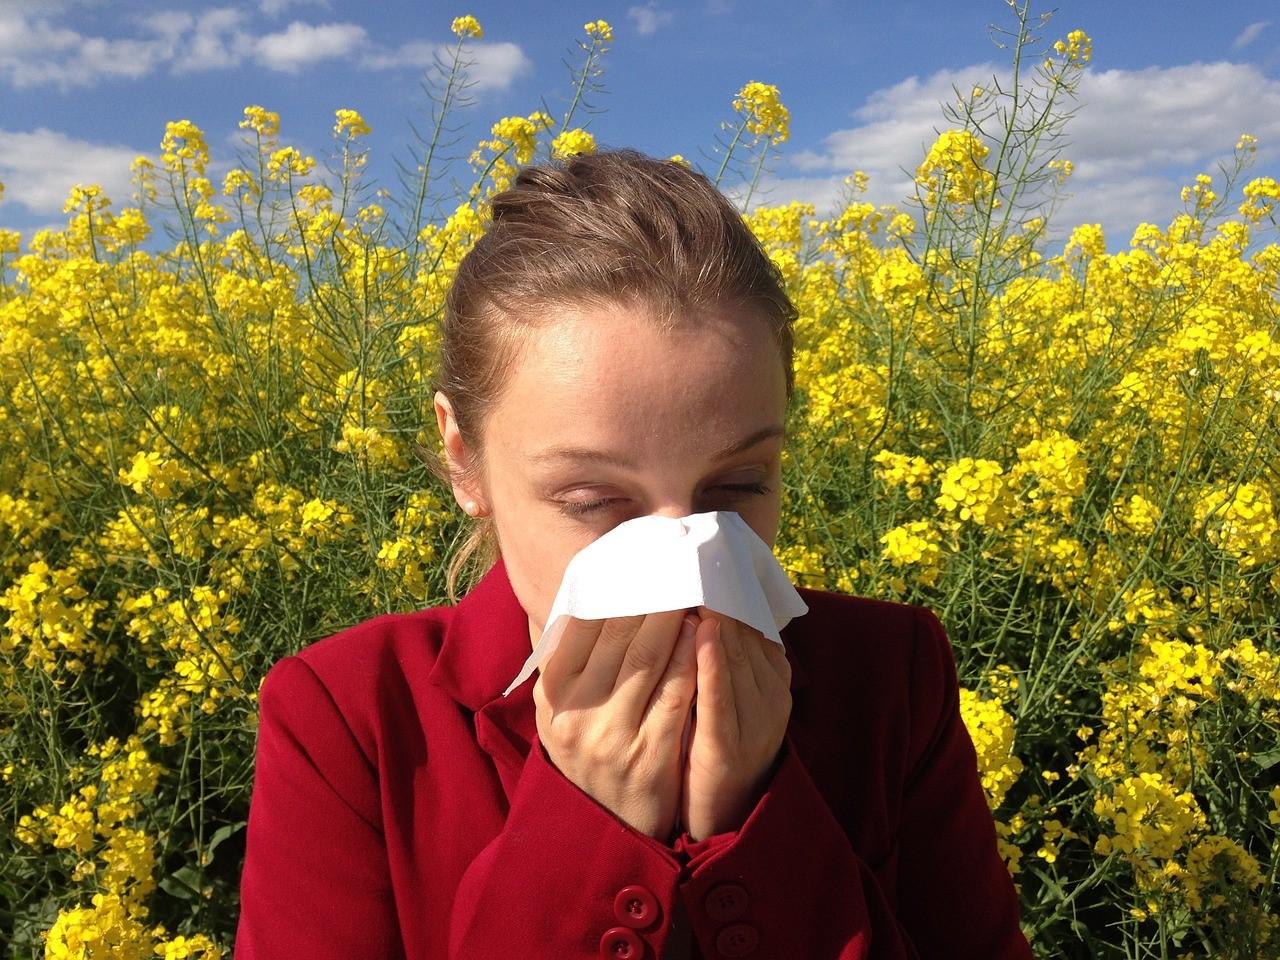 Apa Saja Penyebab Alergi Saat Hamil?